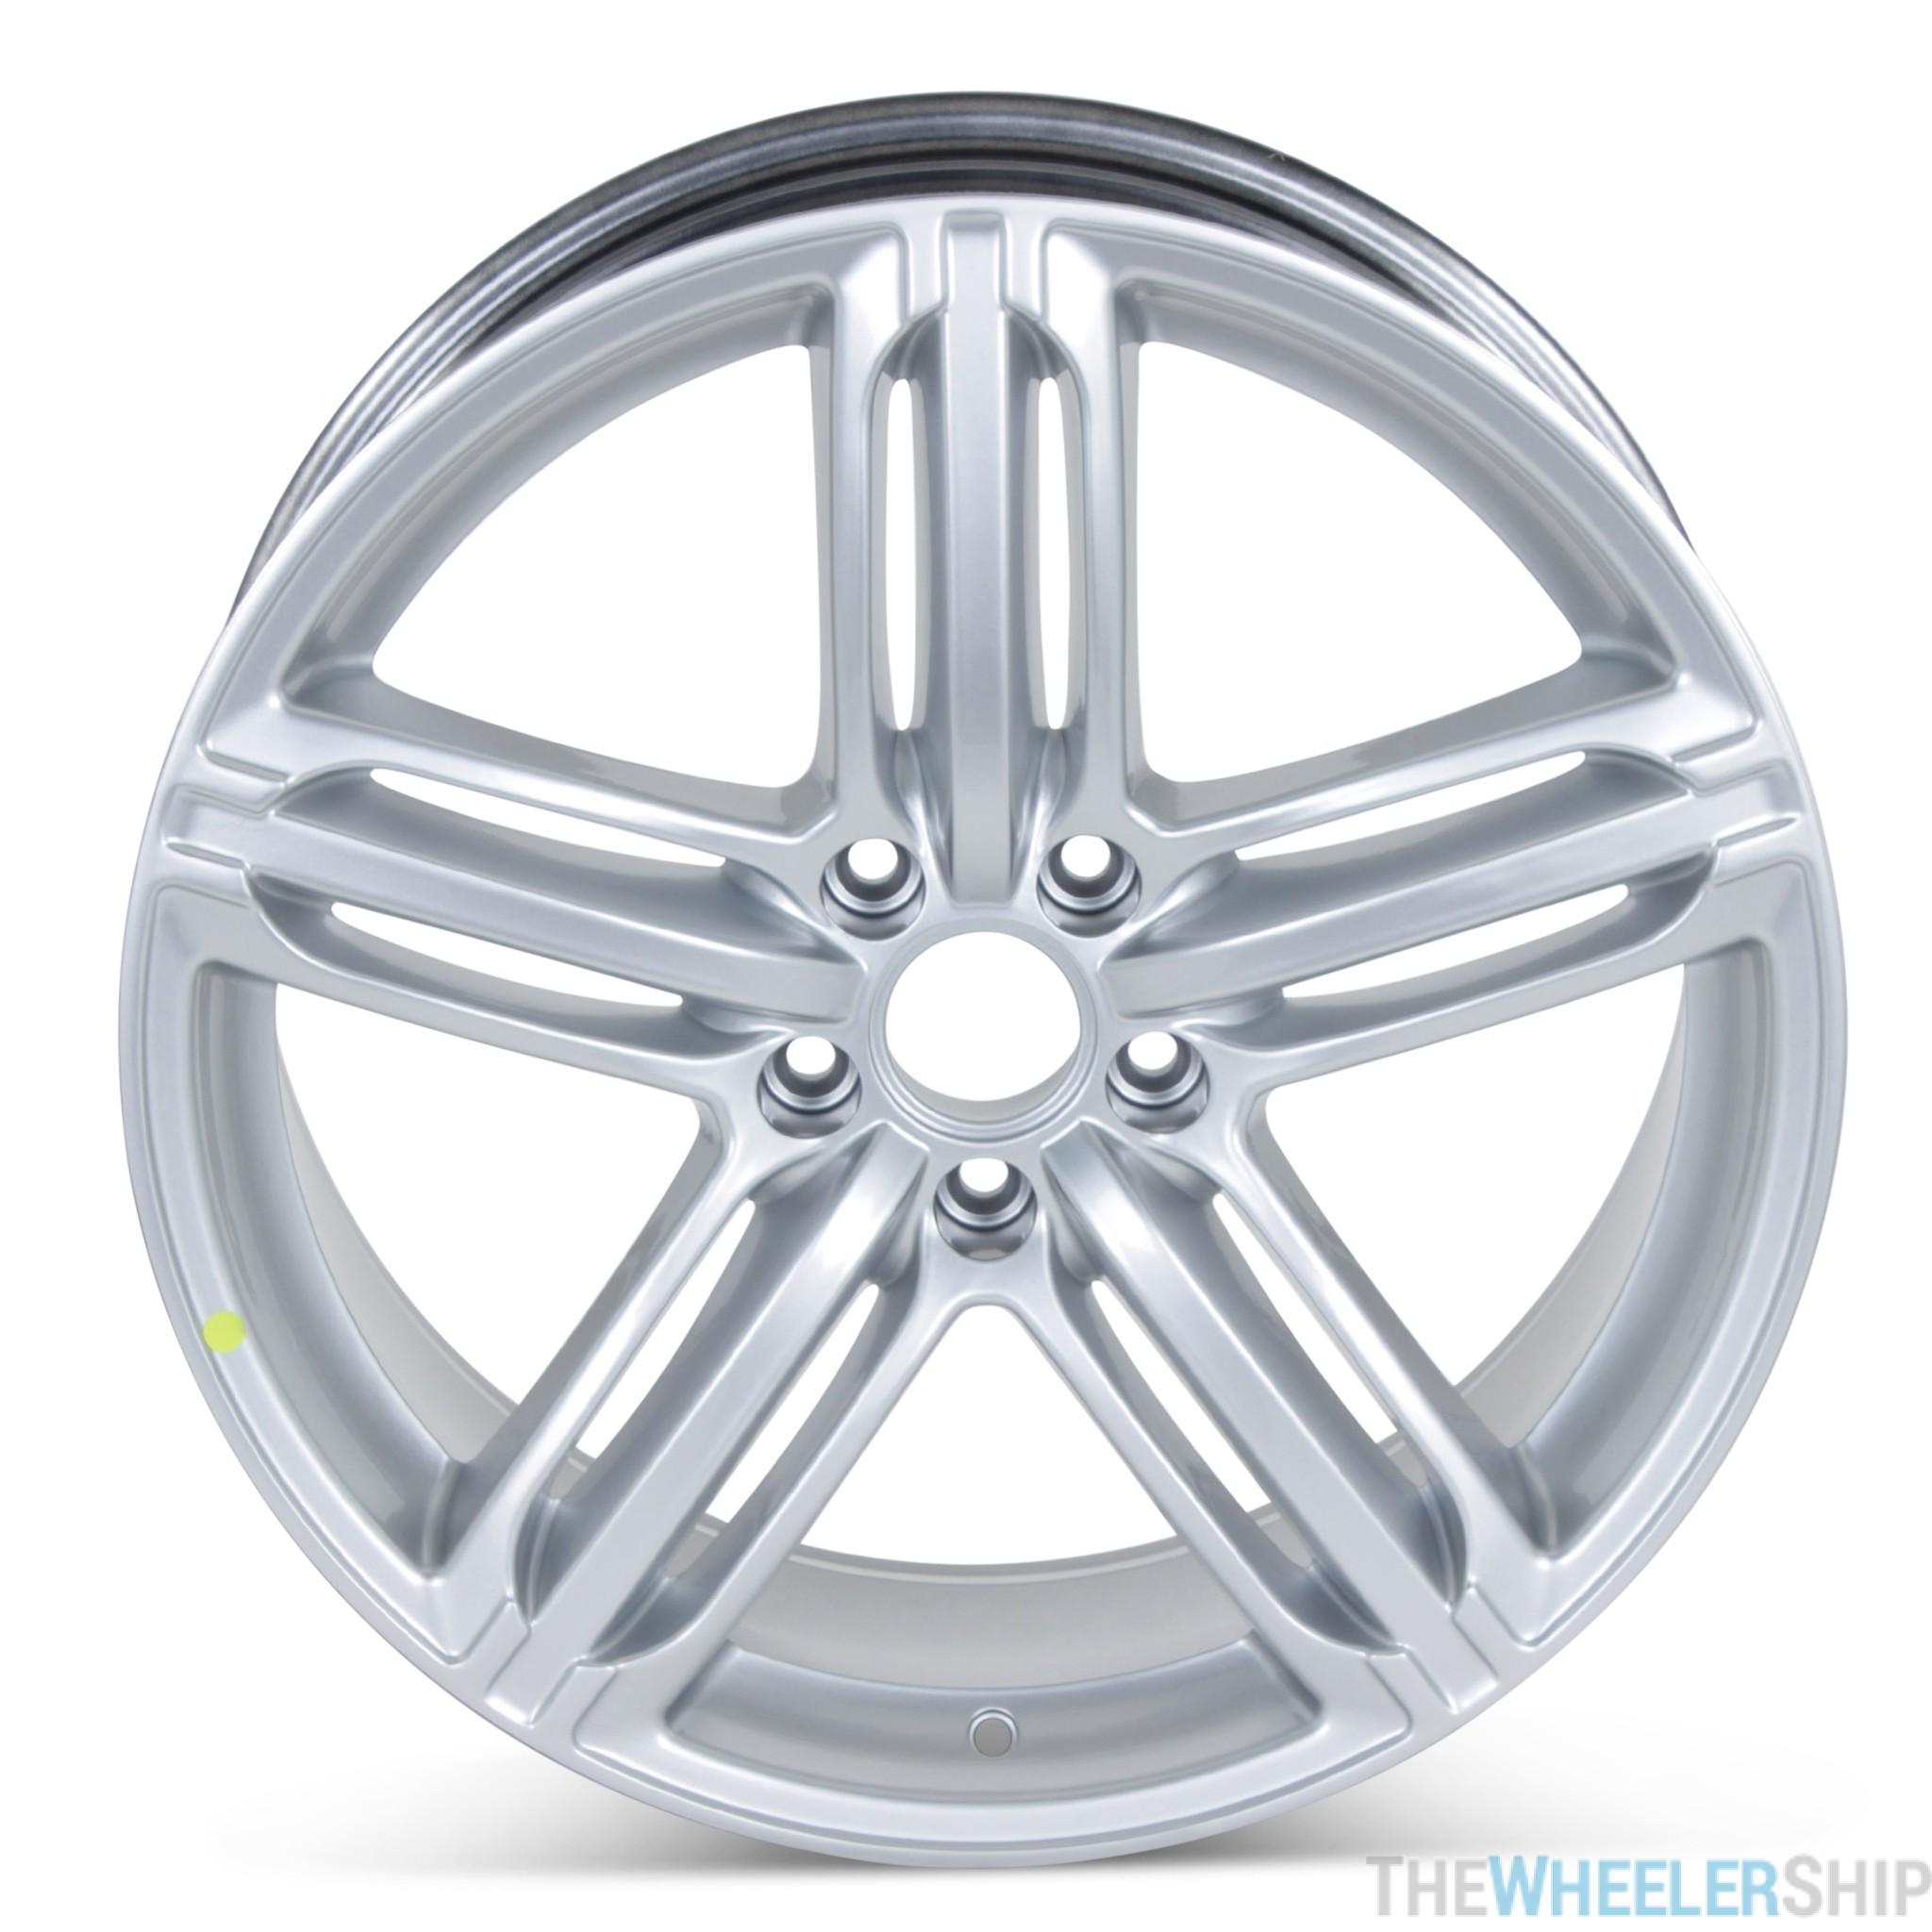 2007, 2009-2016 Audi A4 & S4 Wheels